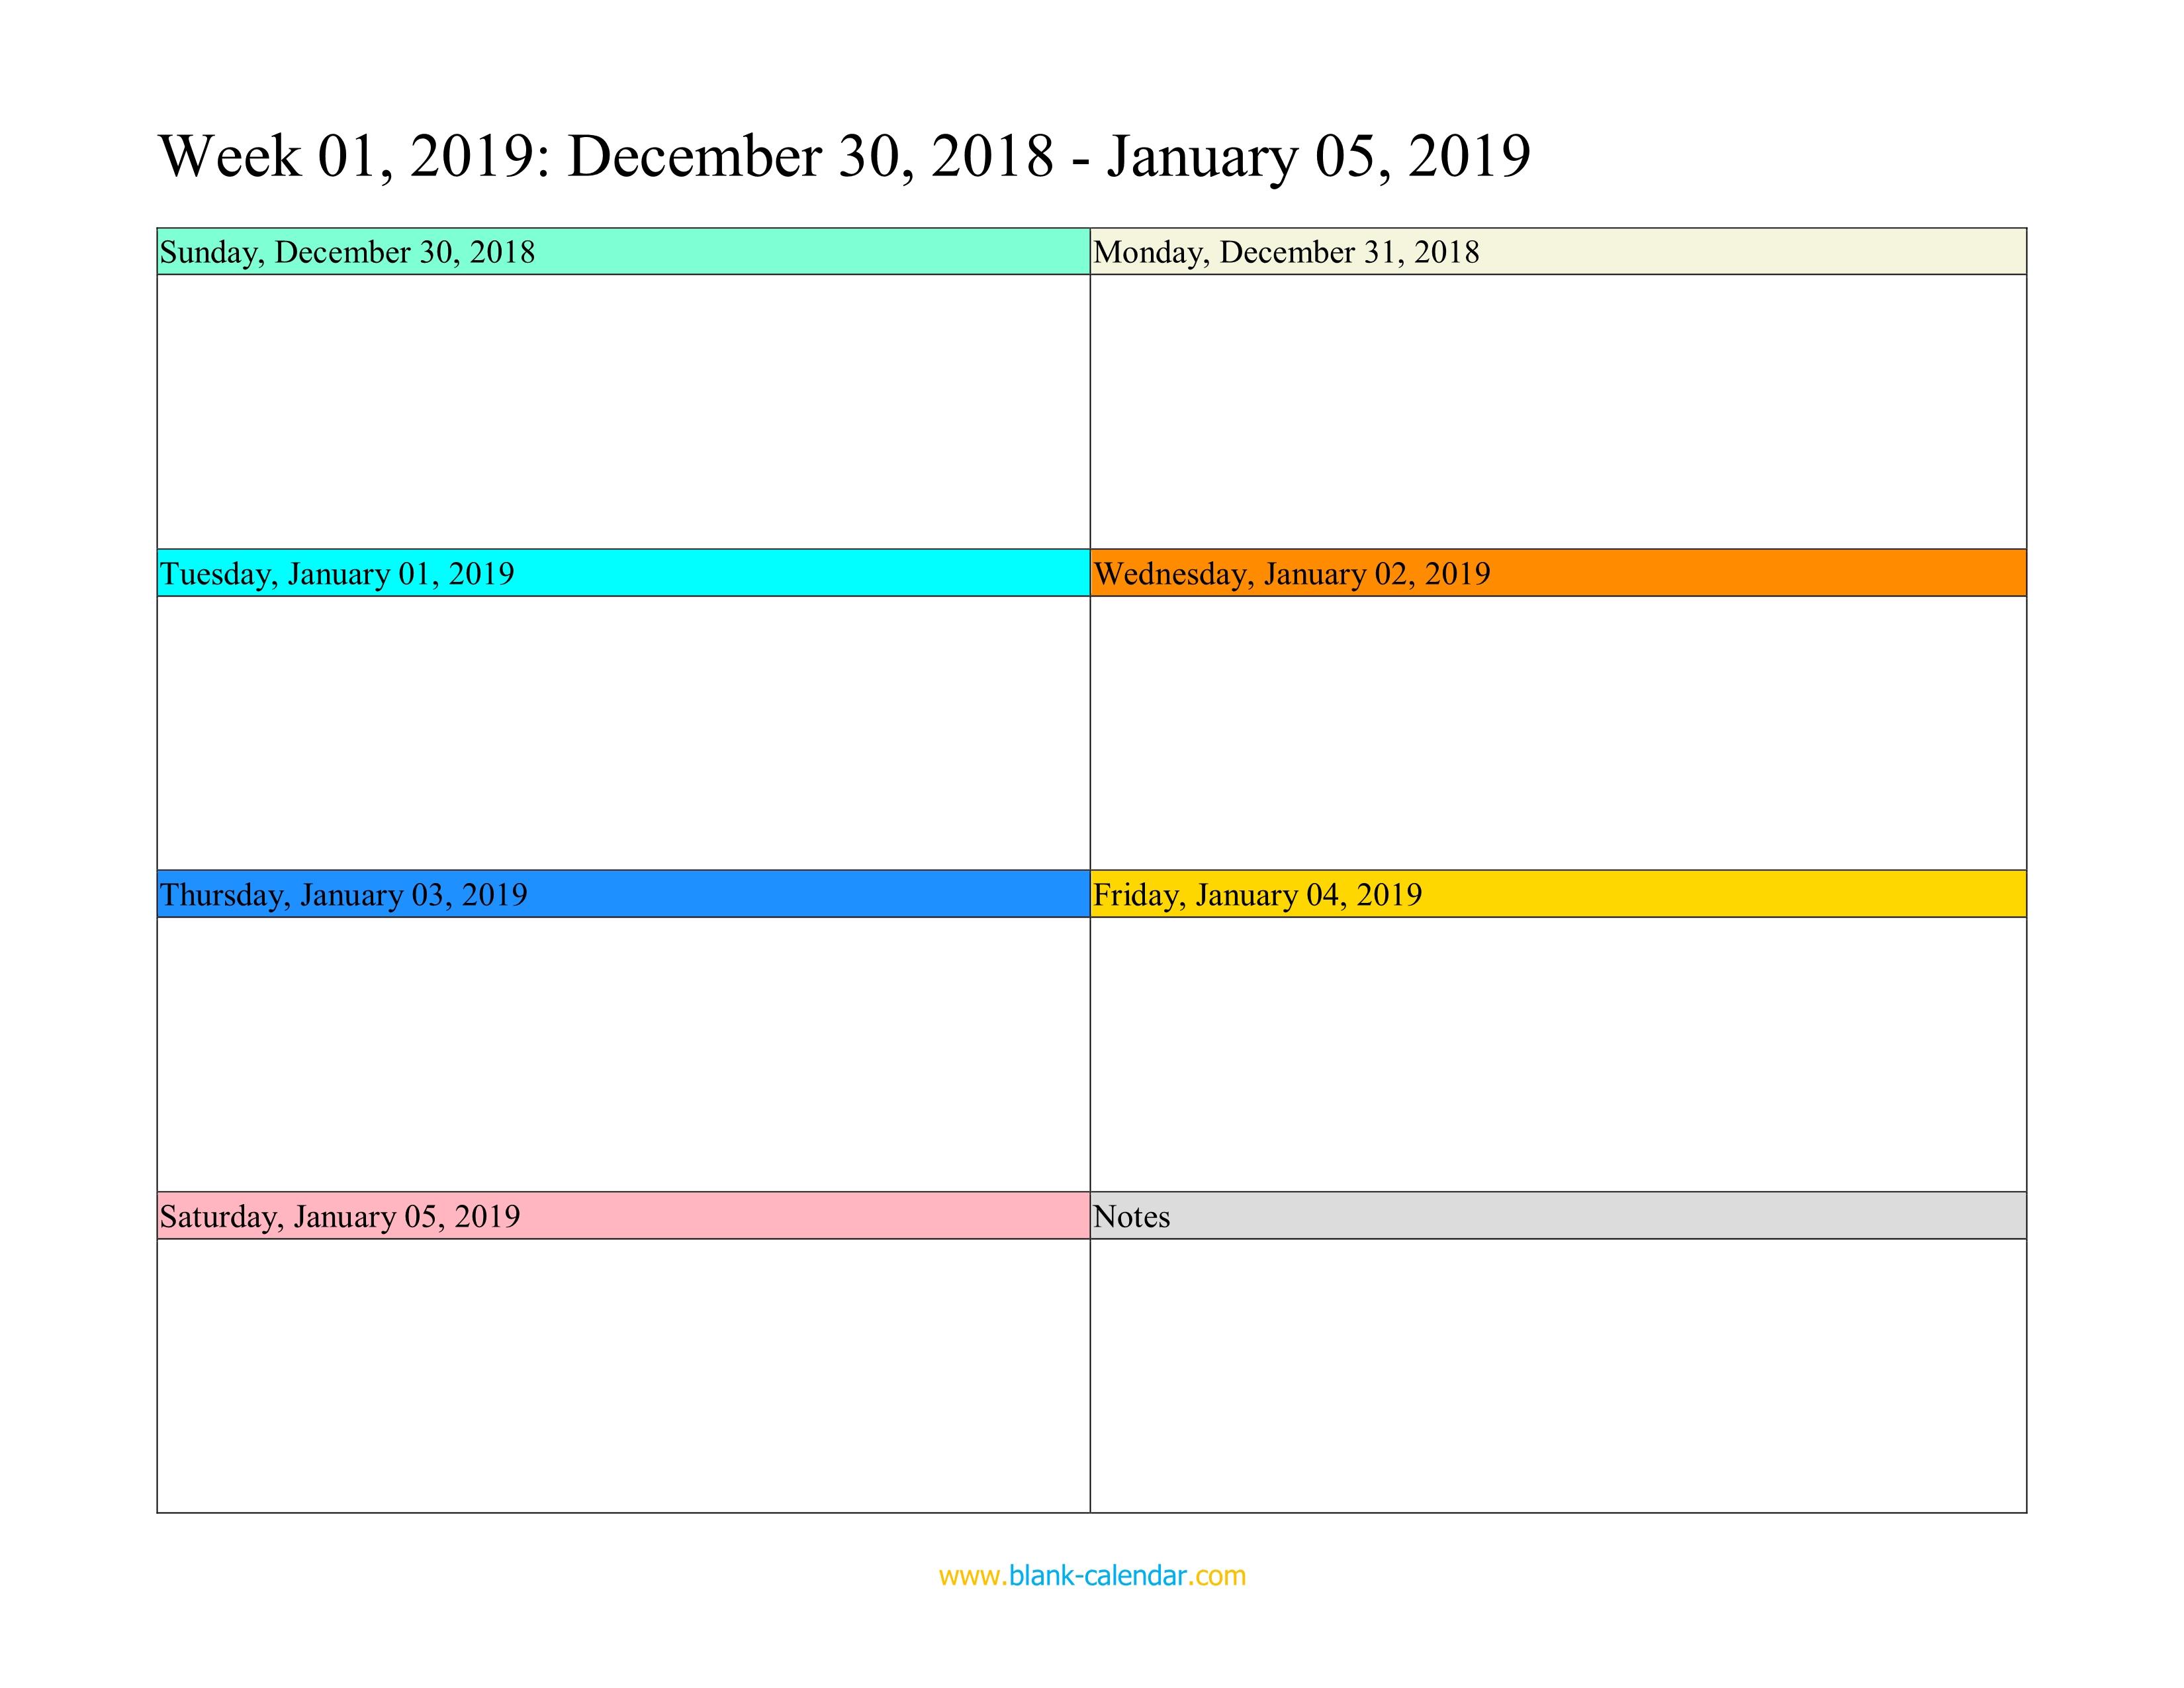 Print Blank Weekly Calendar Schedule Template Outlook | Smorad within Printable Blank Weekly Calendars Templates